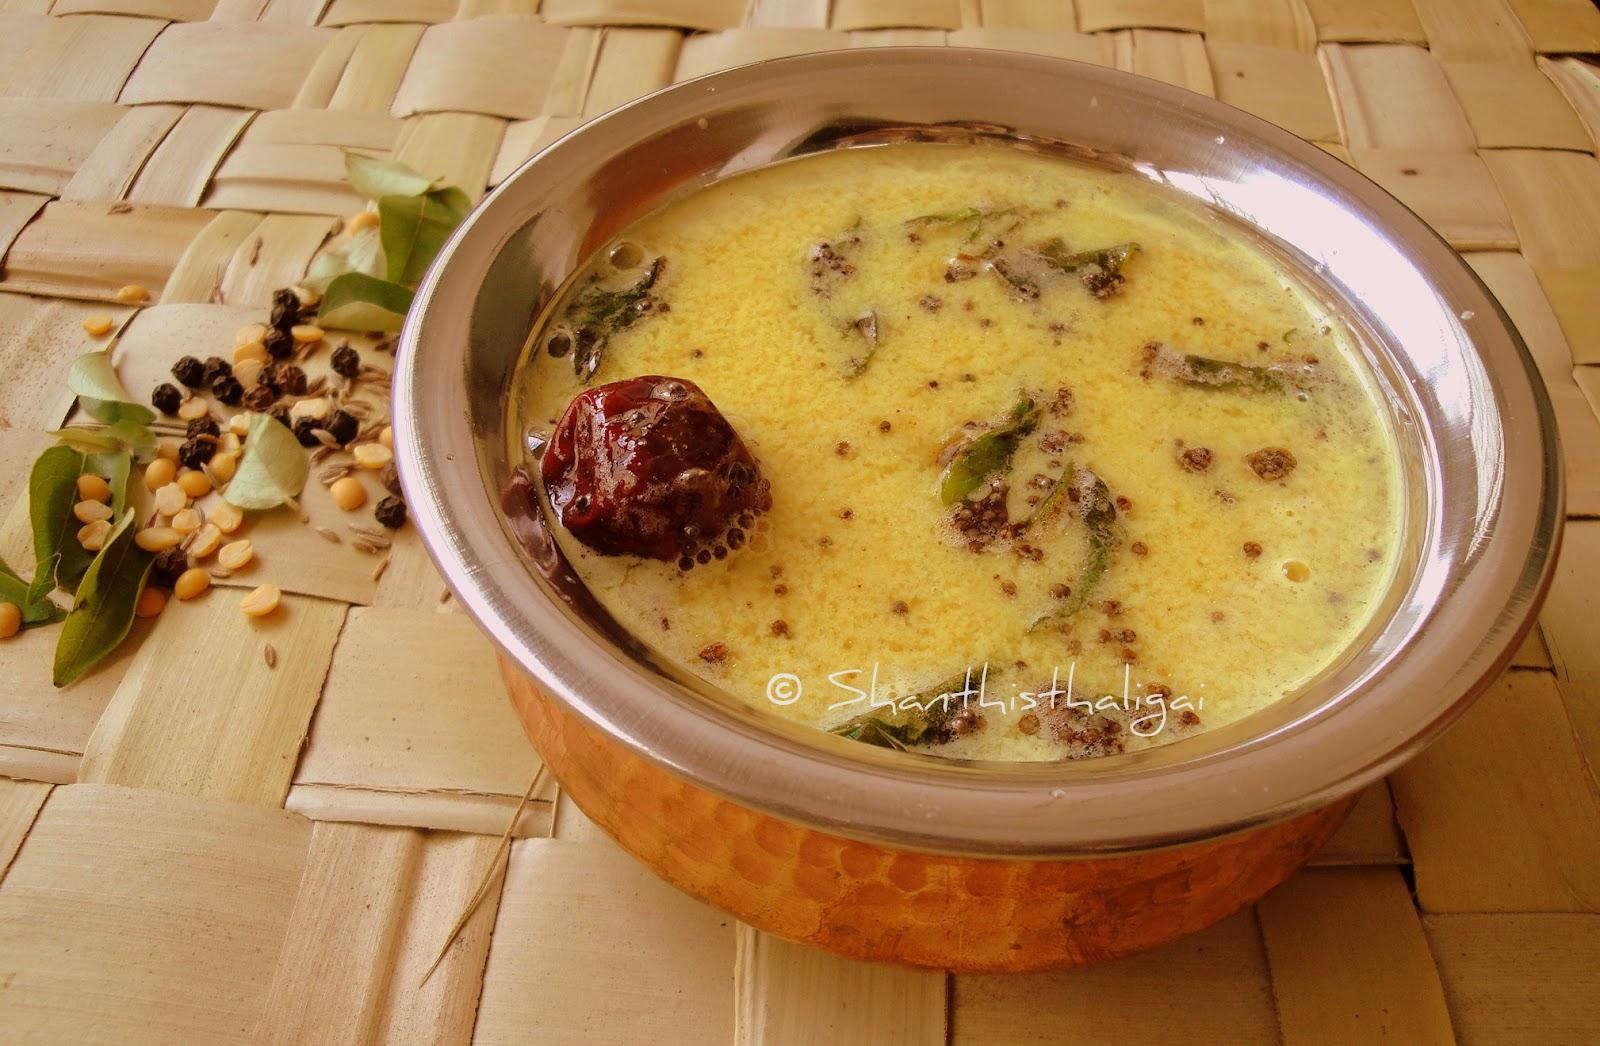 How to make Mor sathamudhu, How to make Mor rasam, How to make Majjige saaru , How to make Buttermilk rasam